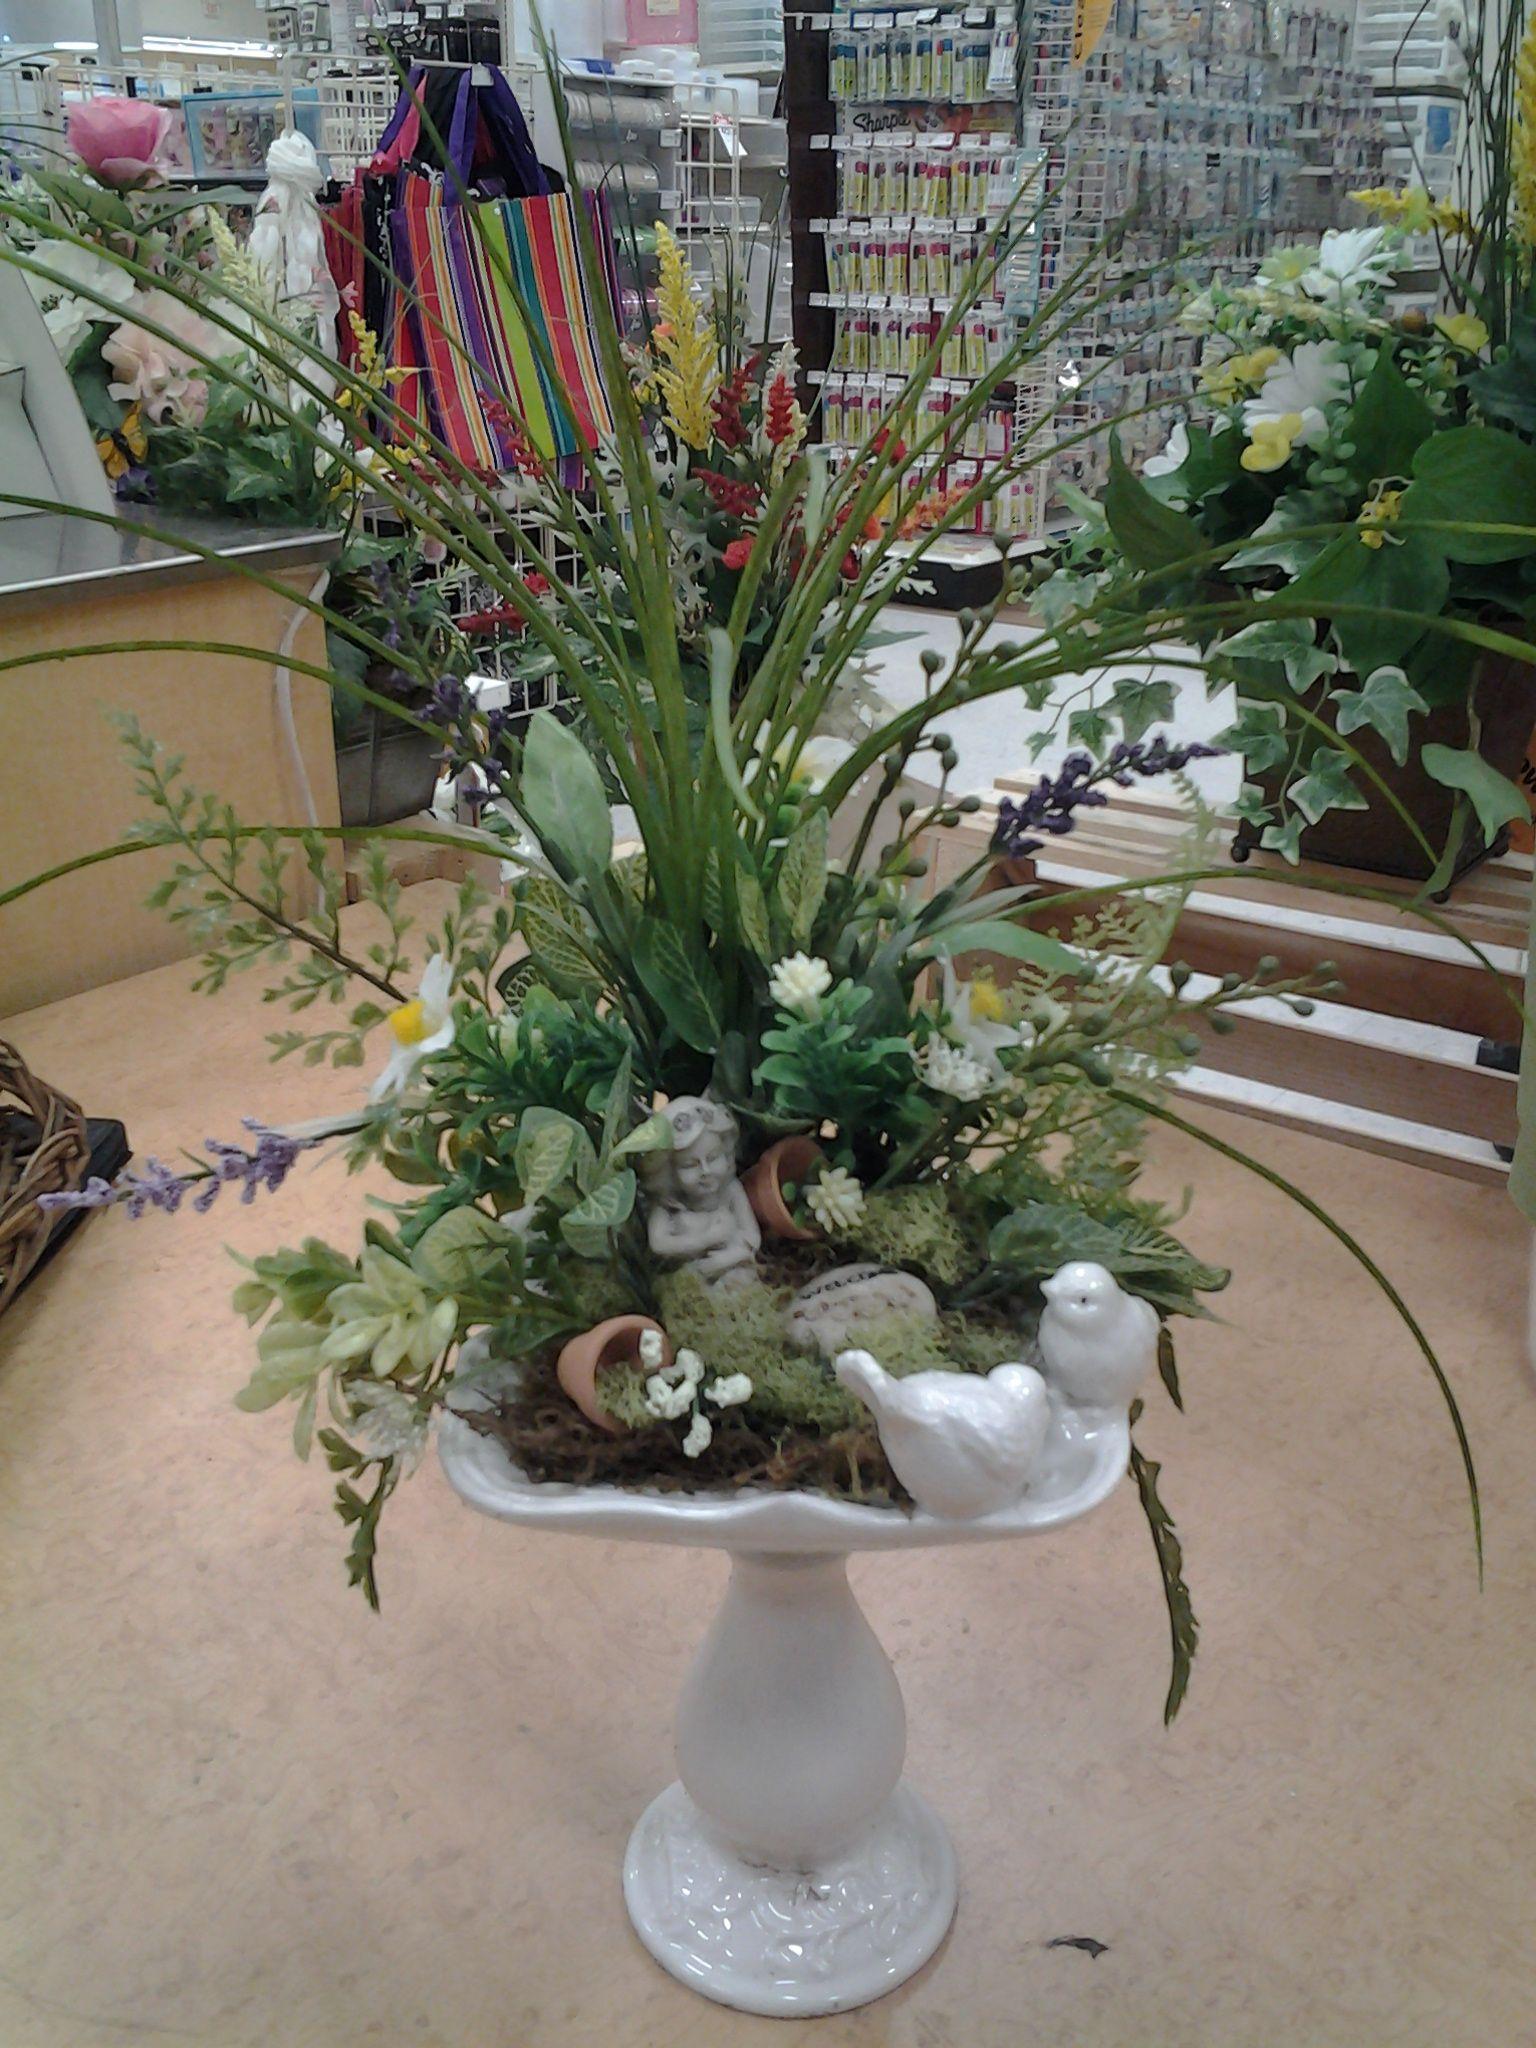 Fairy Garden Cindy 2717 Spring Floral Arrangements